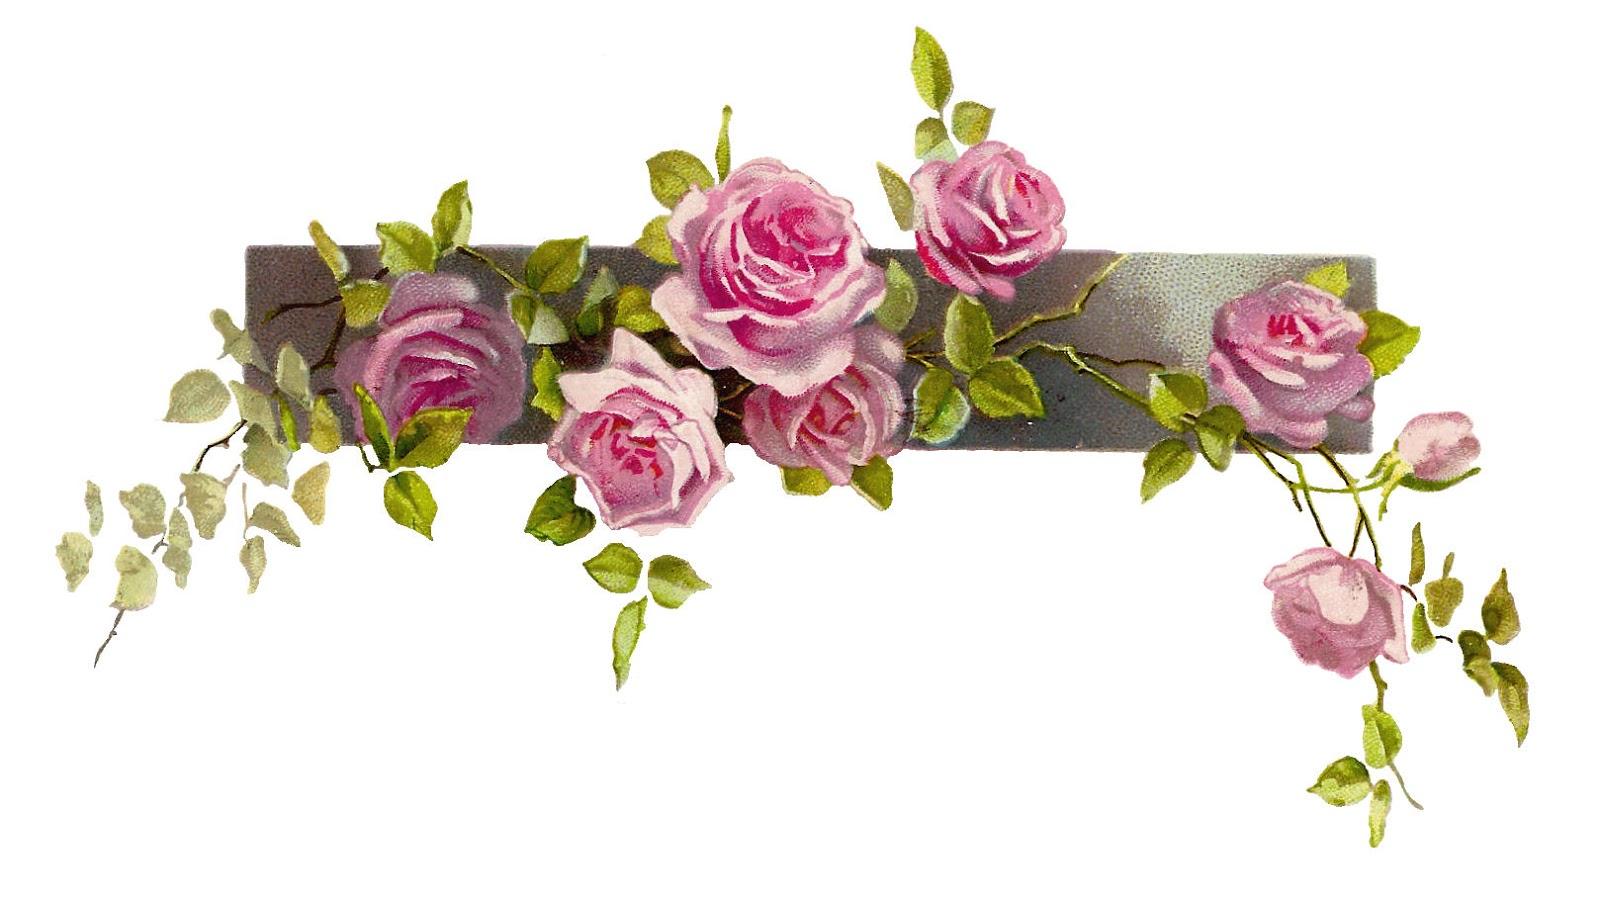 Rose clipart antique flower #5